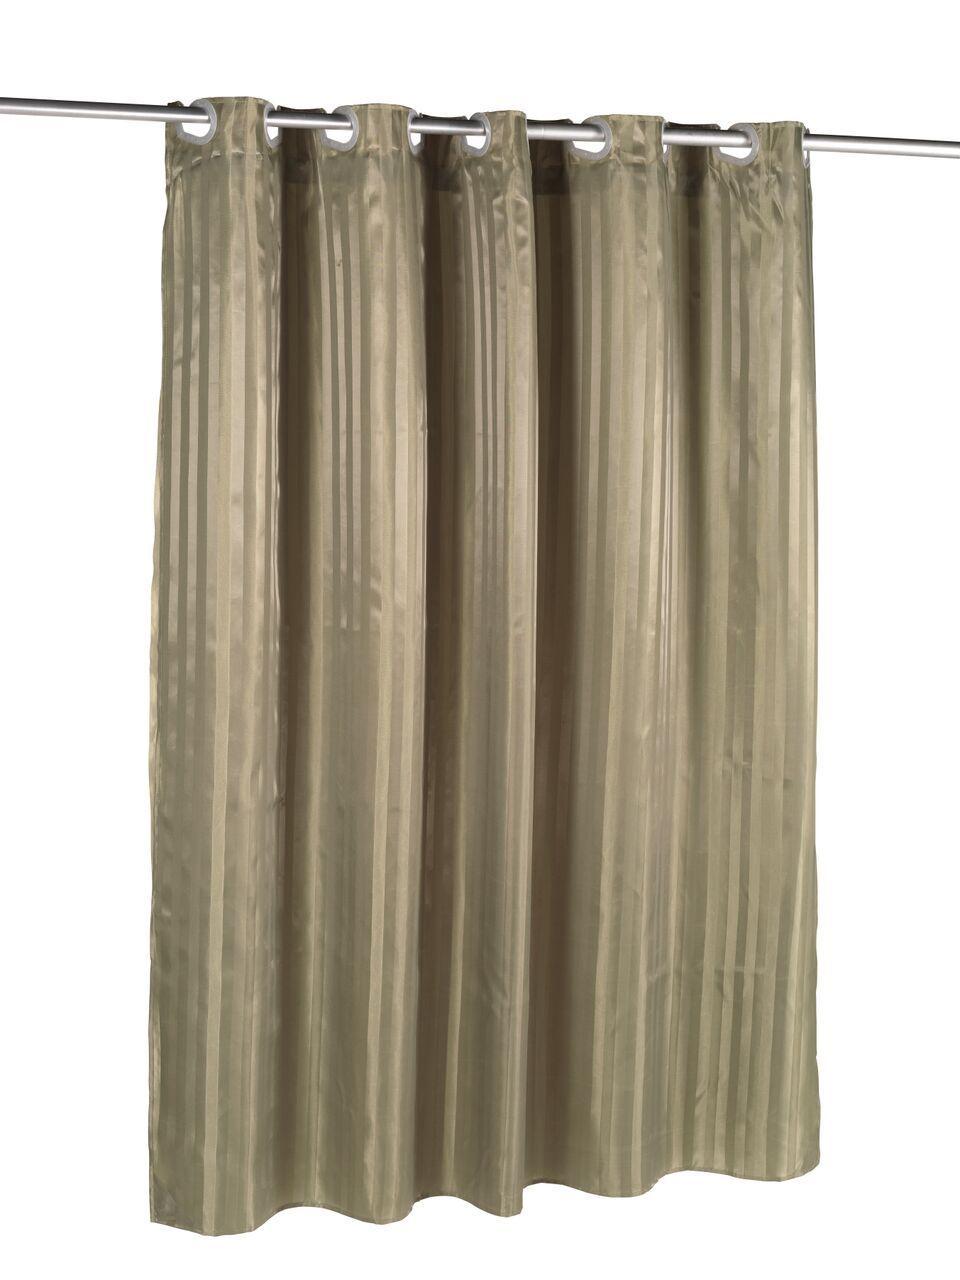 Sage Pre HookedTM Satin Stripe Fabric Shower Curtain